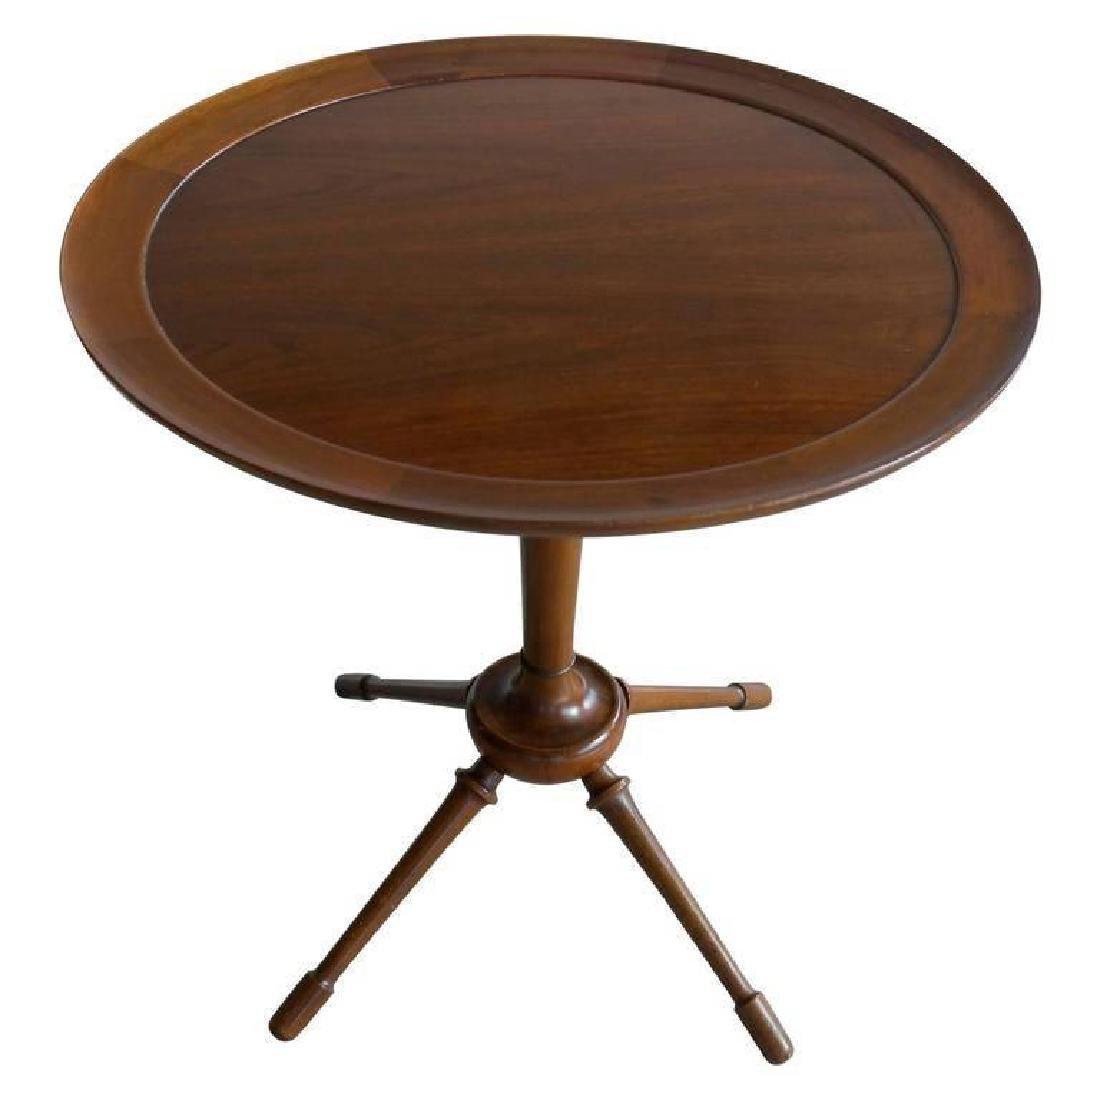 FRITS HENNINGSEN CUBAN MAHOGANY SIDE TABLE